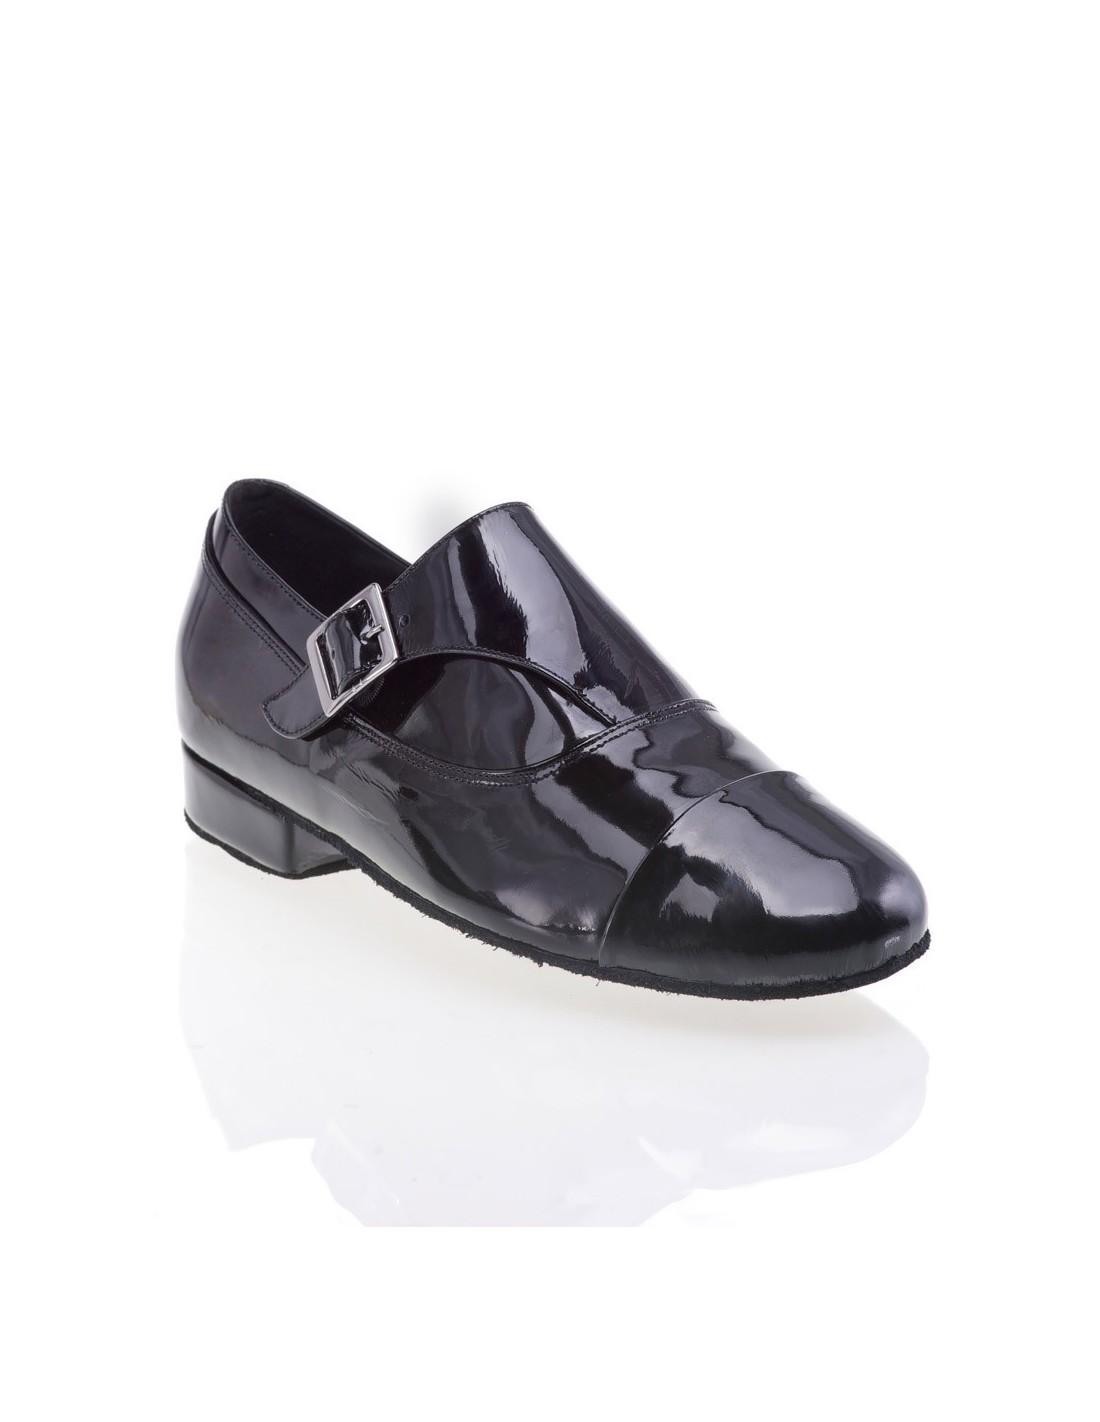 Chaussures danse salon cuir noir semi transparente ...